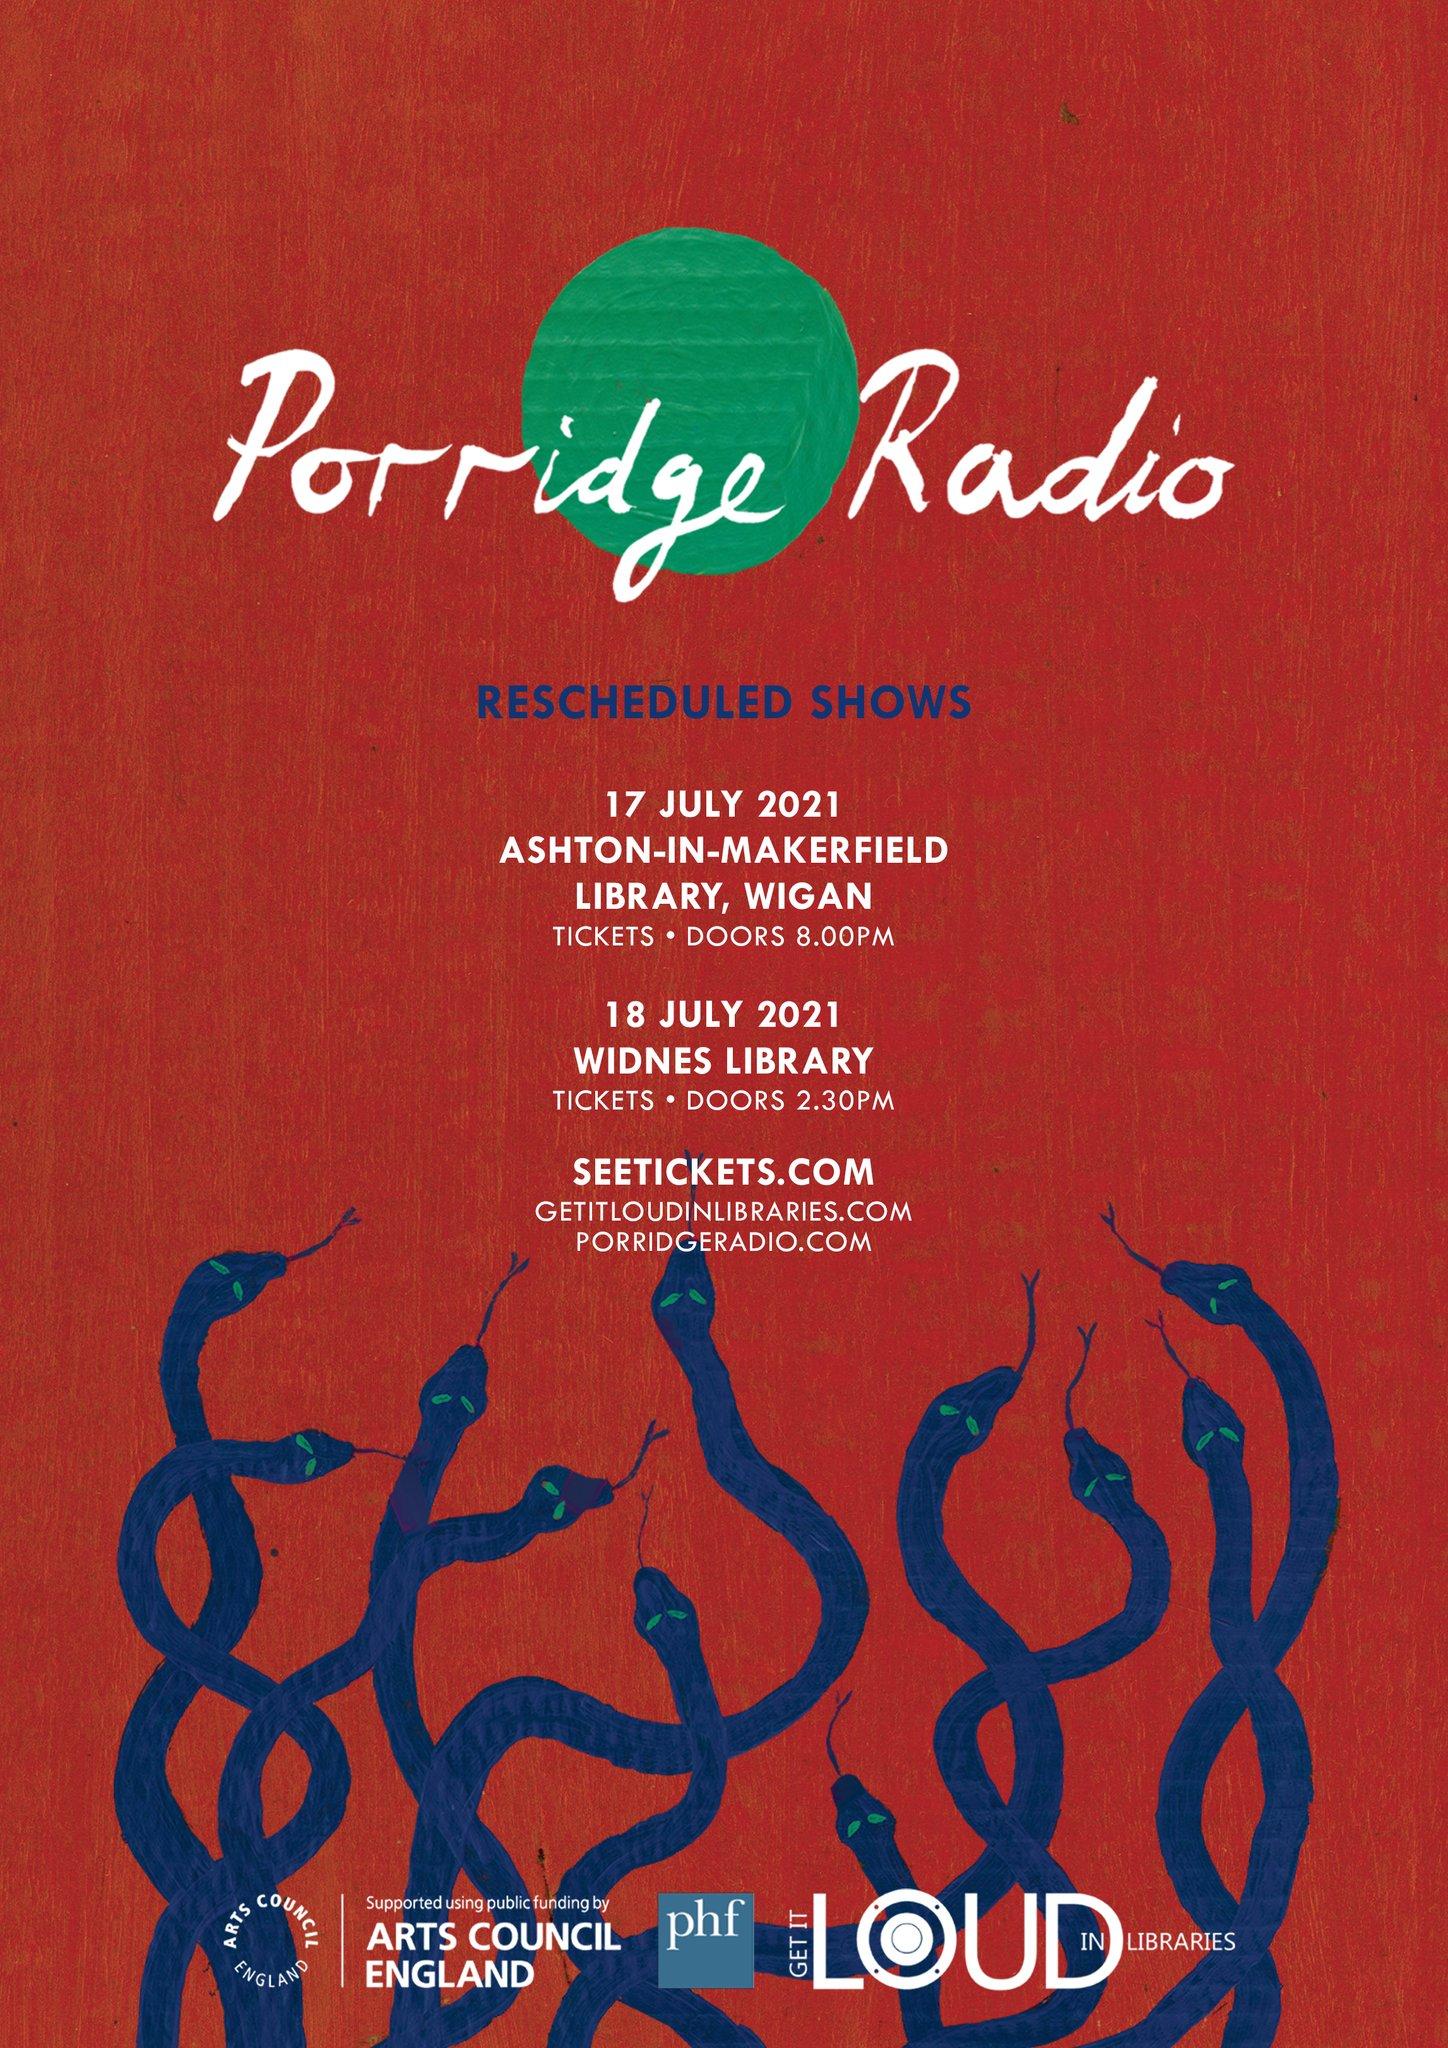 Porrdige Radio Both